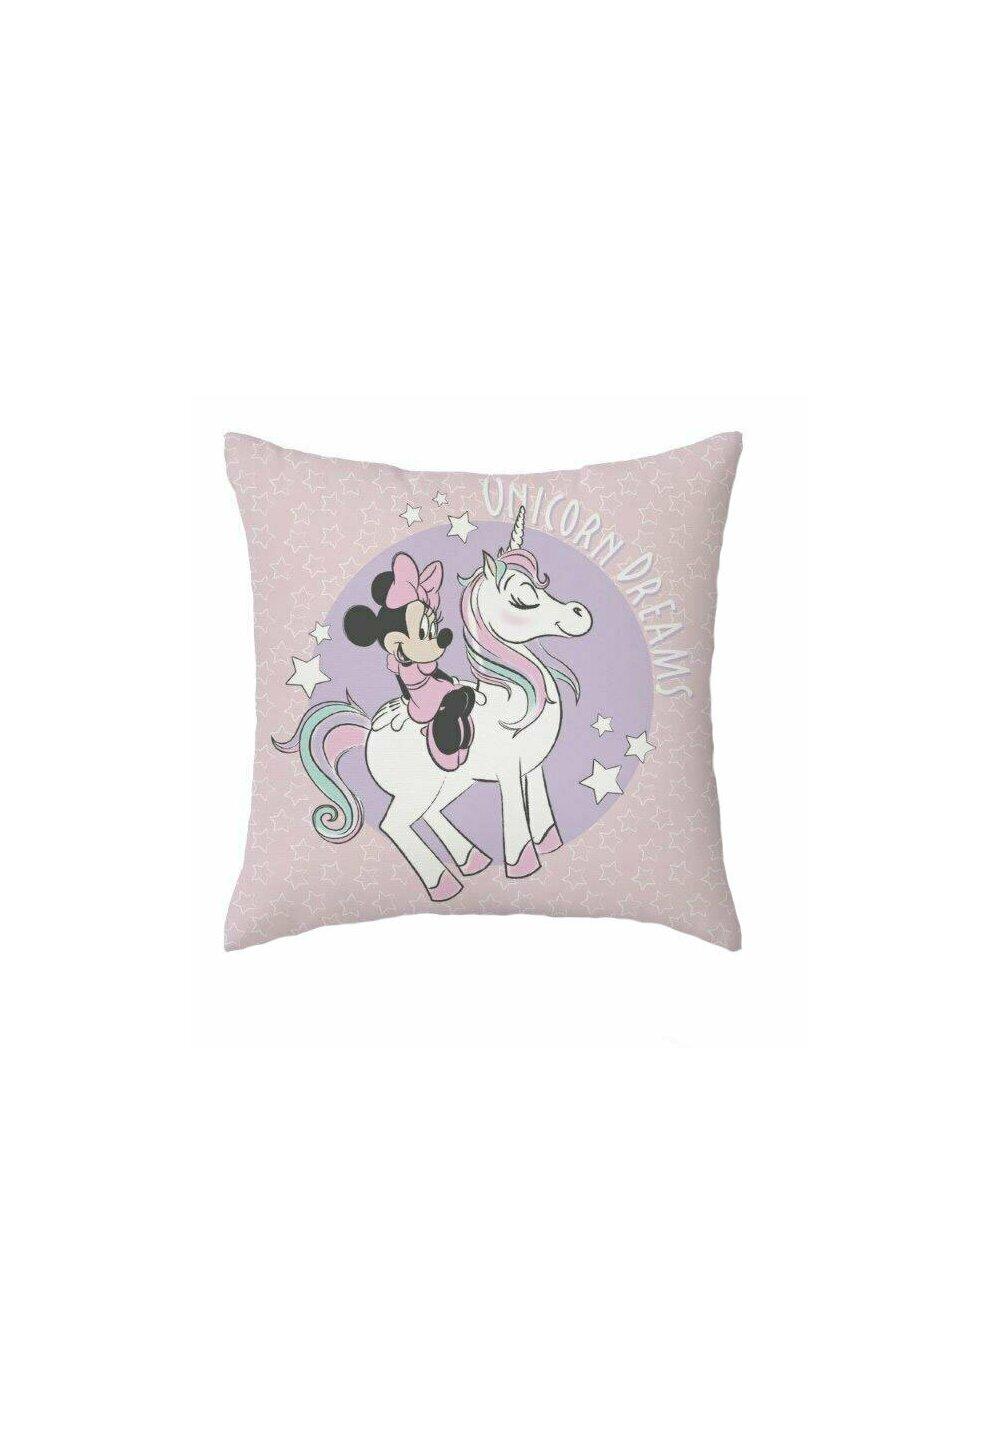 Fata perna, Minnie Unicorn Dreams, roz, 40x40 cm imagine